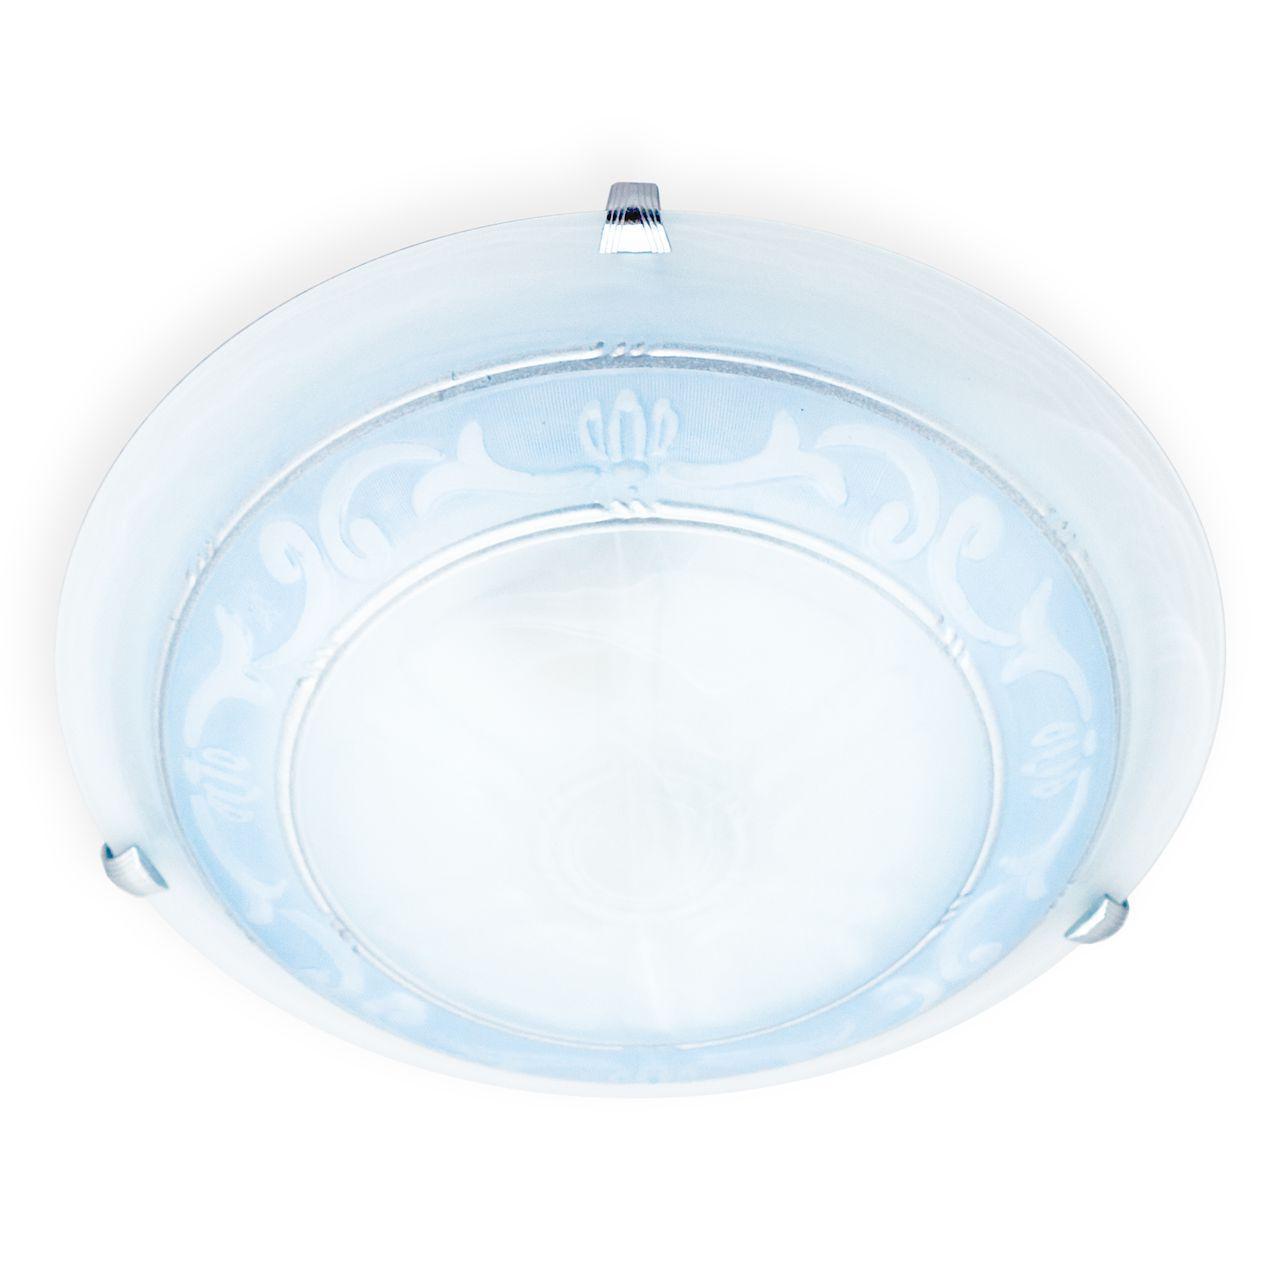 Потолочный светильник Toplight Elizabeth TL9091Y-02BL